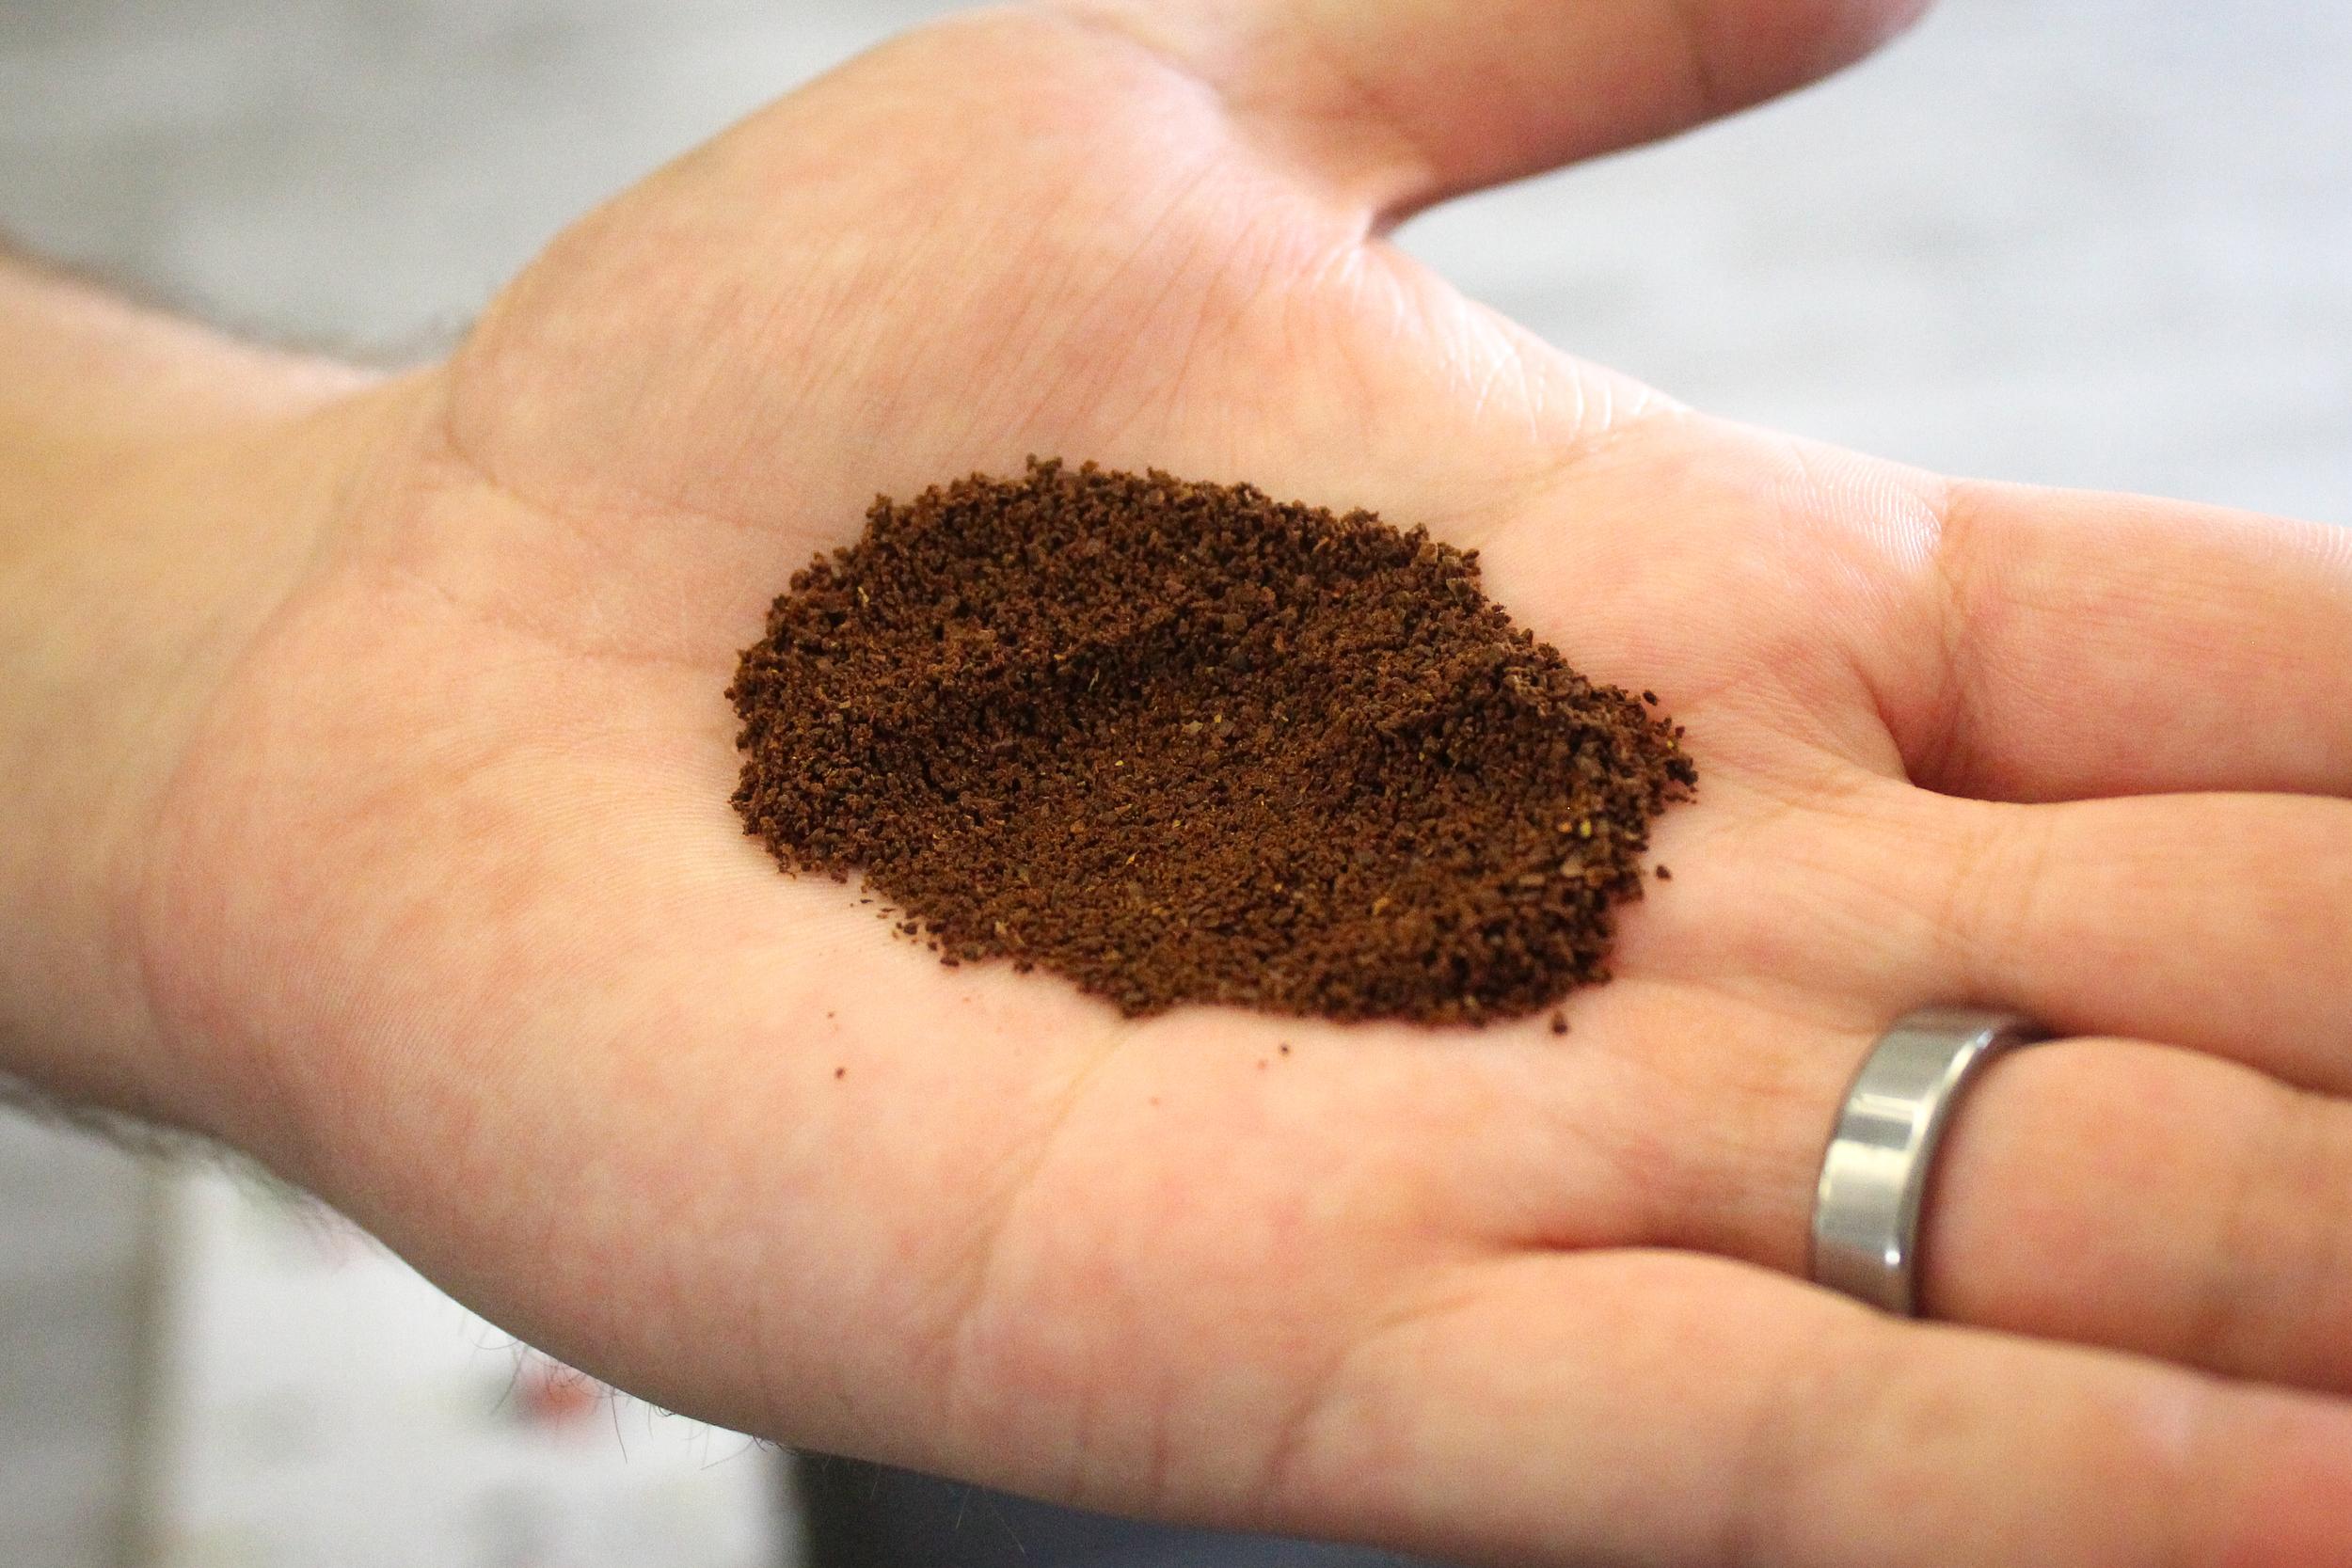 3. Grind coffee to medium-fine consistency (like table salt).